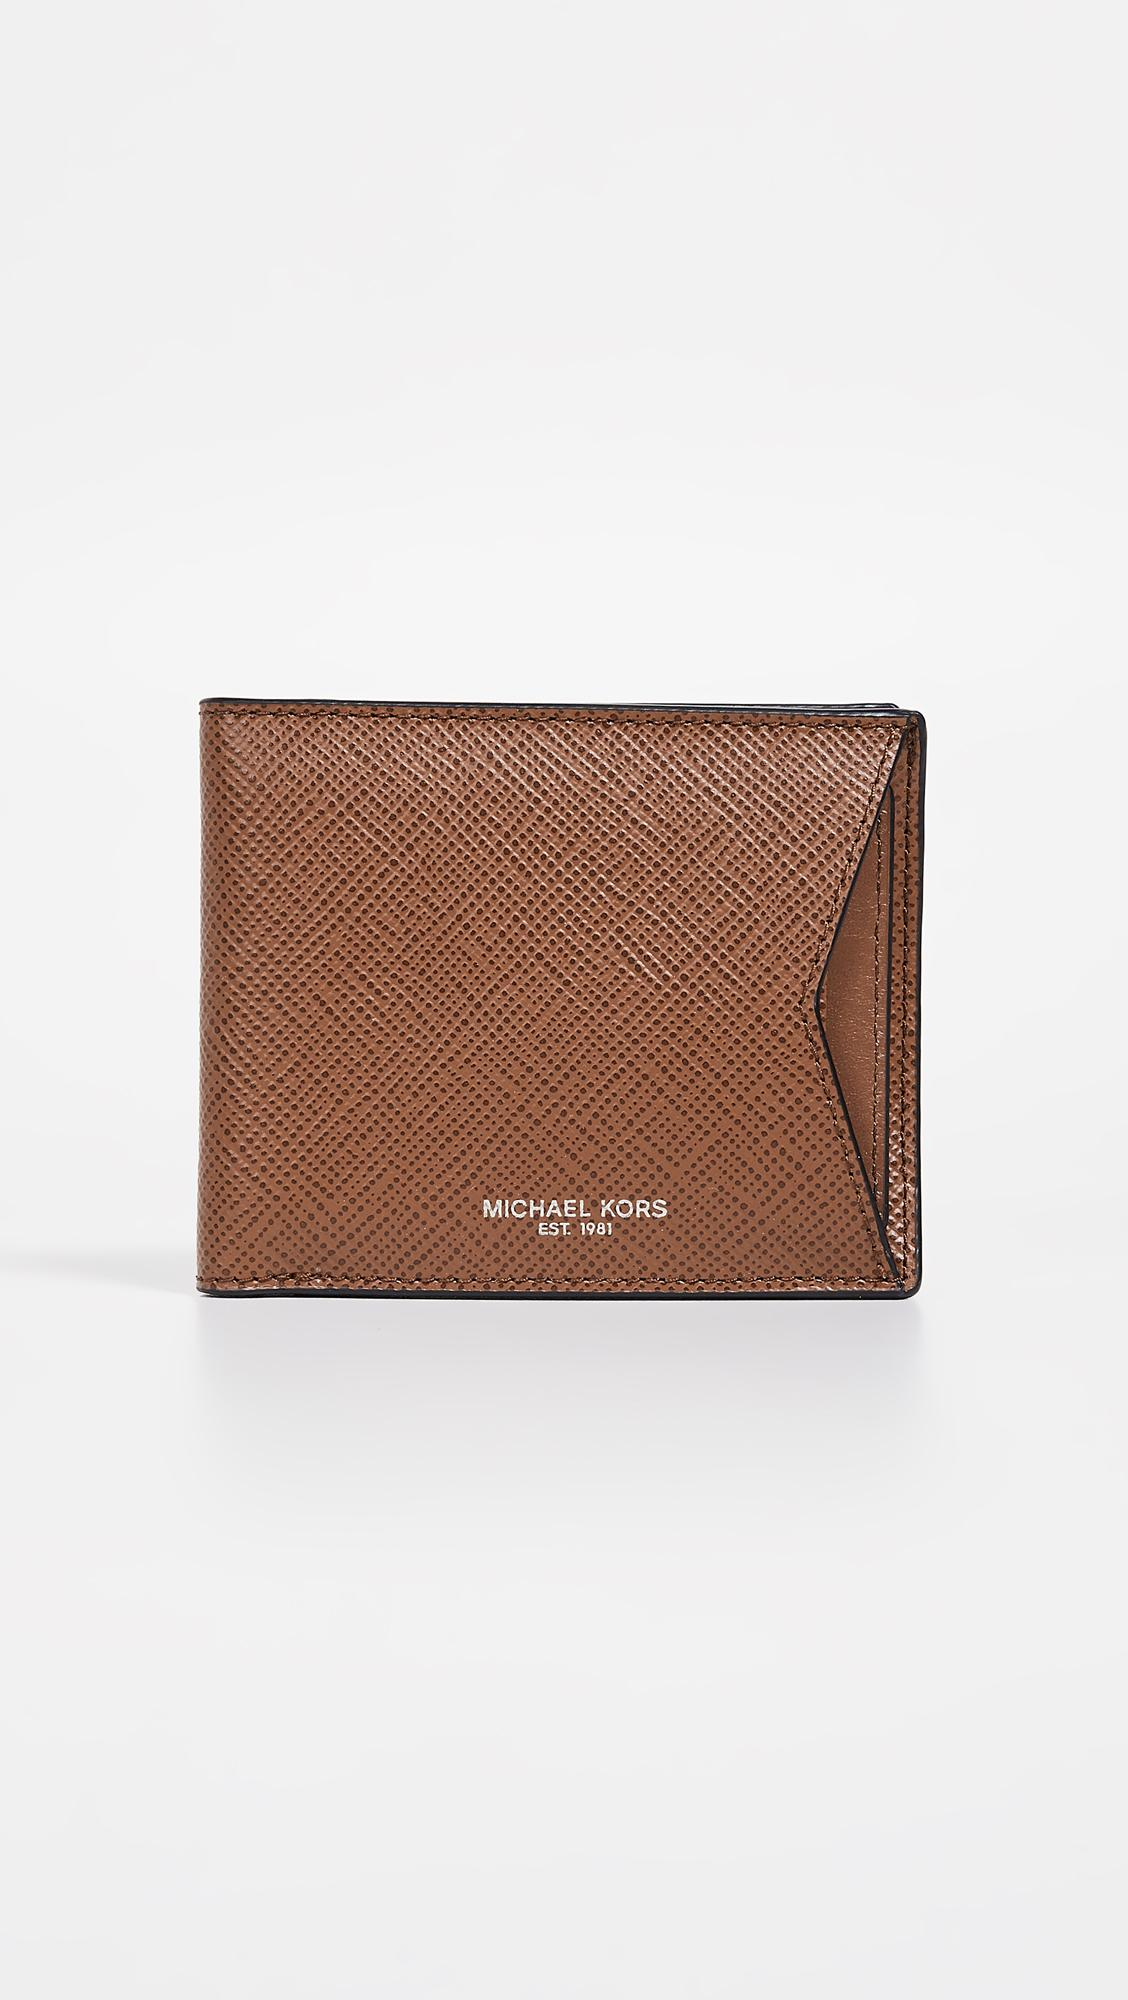 df72bddce890 Michael Kors Harrison Wallet With Card Case in Brown for Men - Lyst